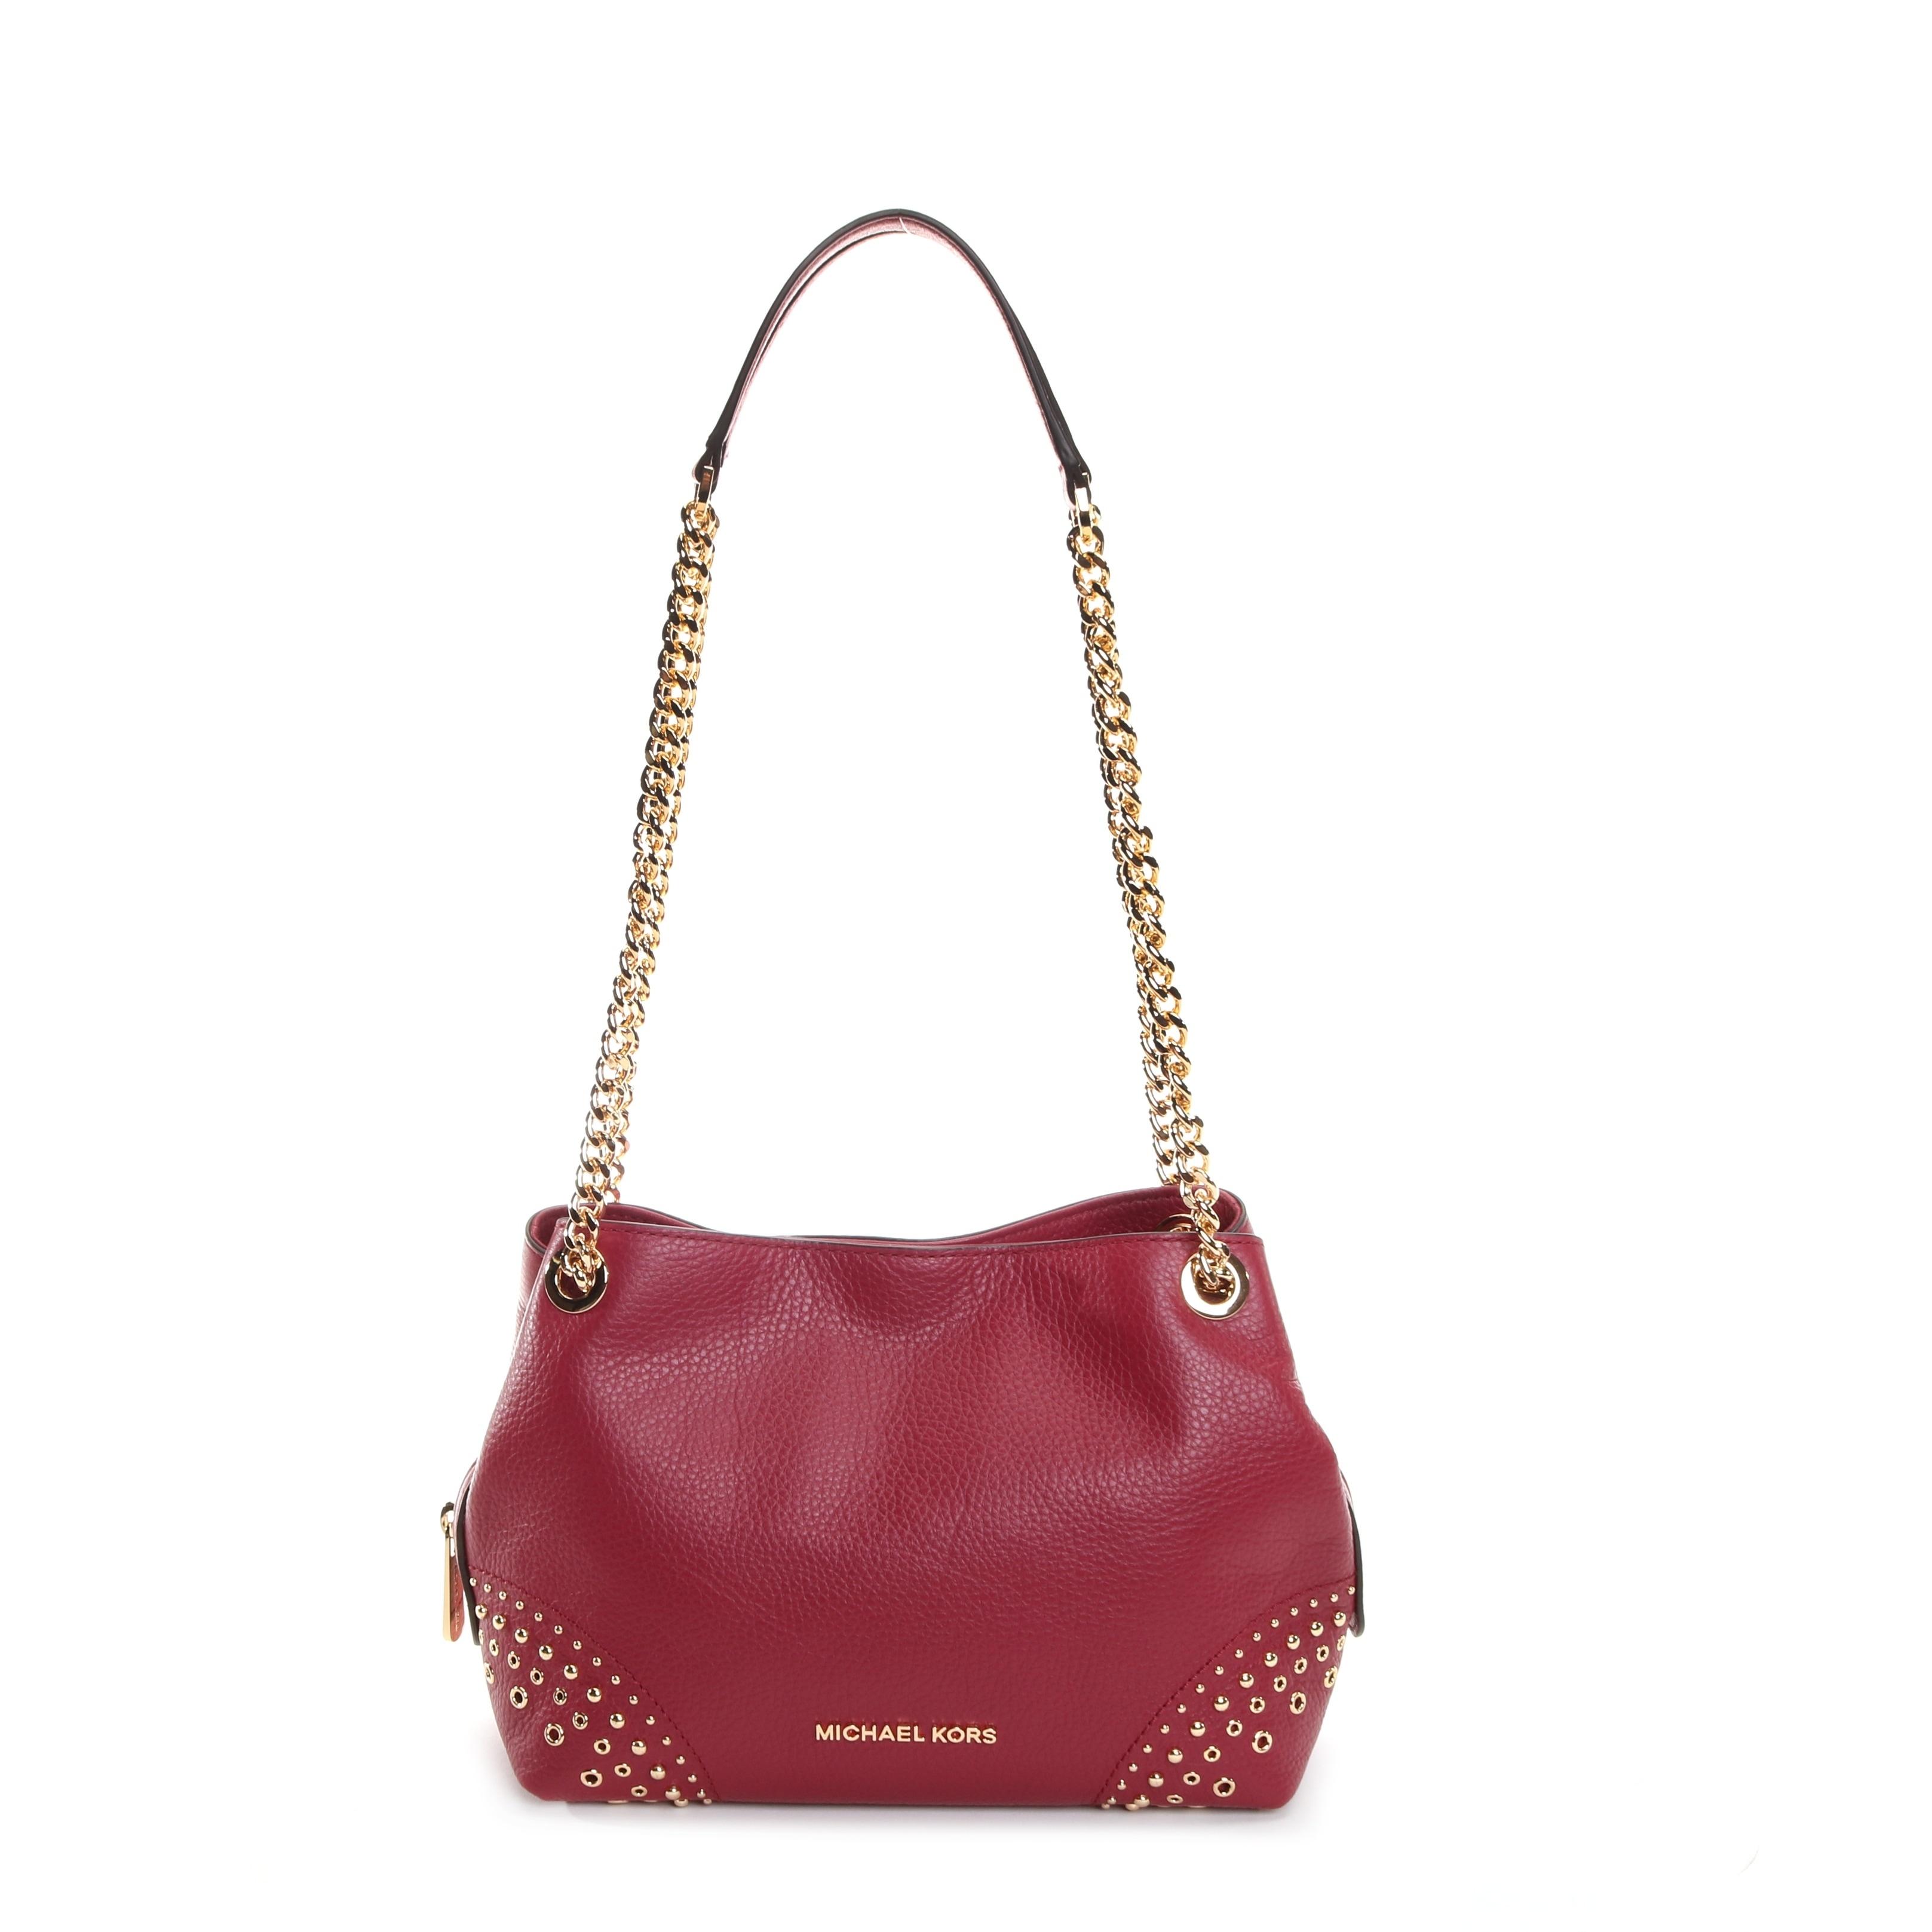 Michael Kors Women S Jet Set Item Medium Chain Shoulder Bag